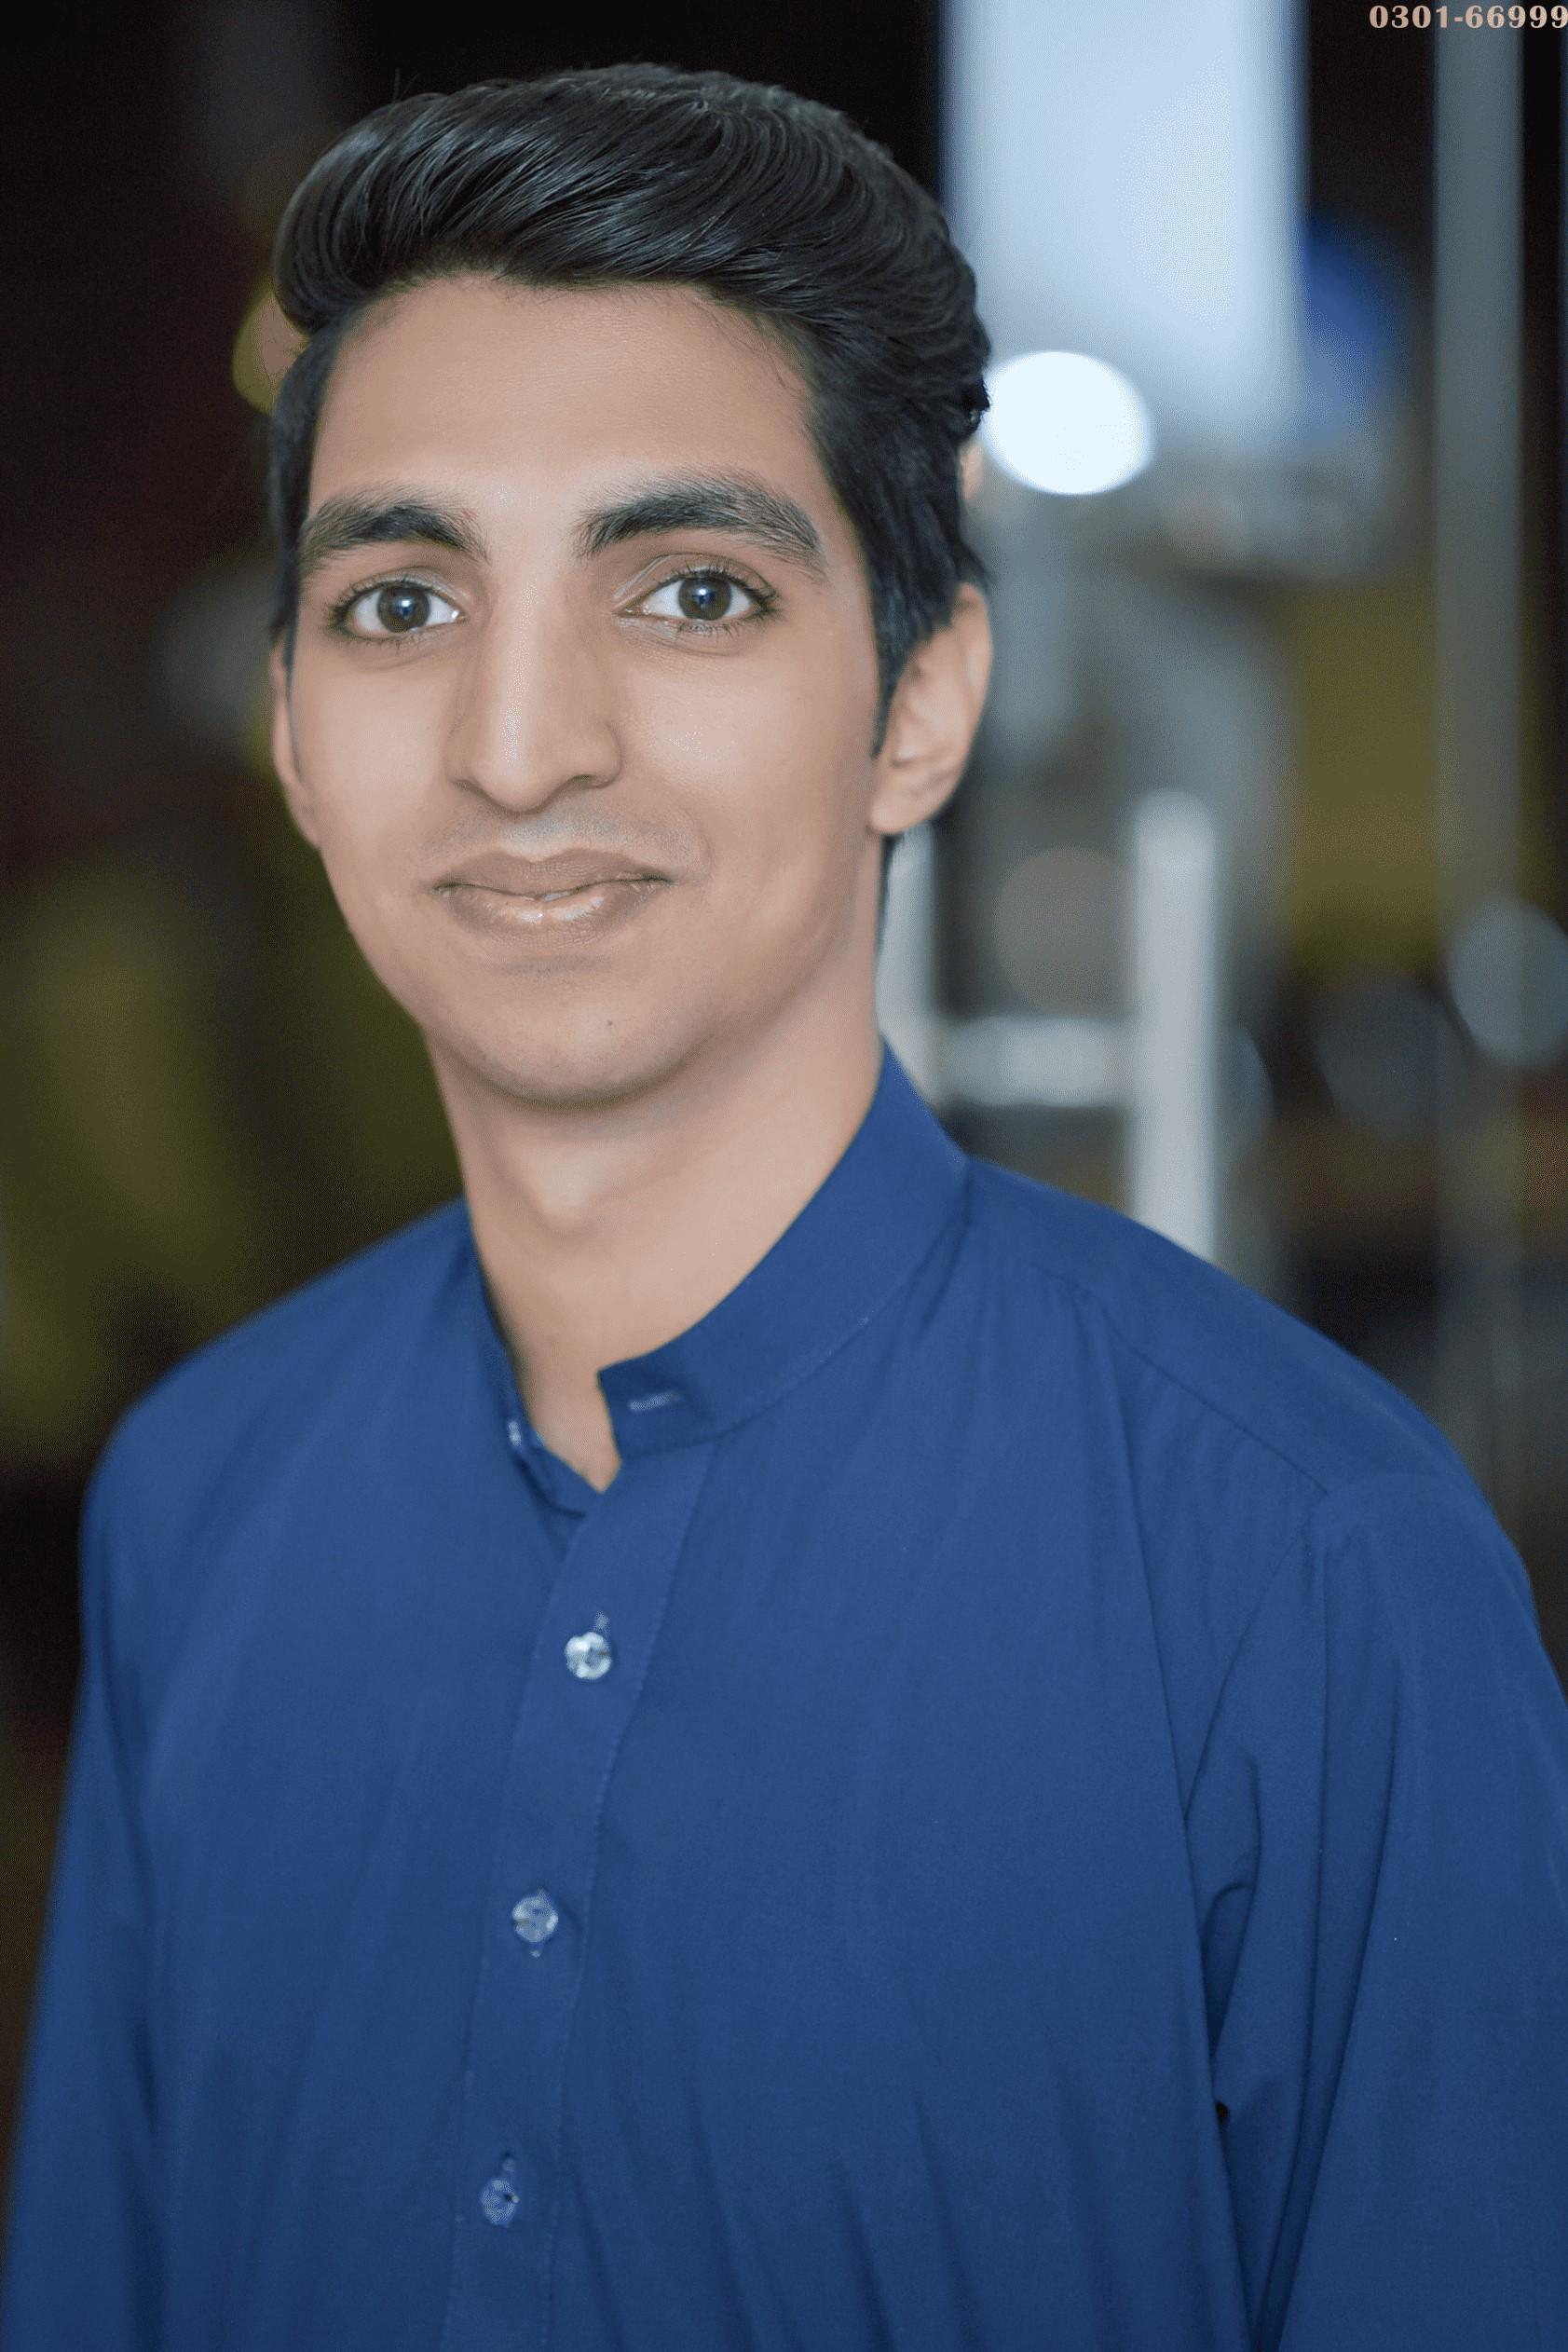 Sharjeel Aftab AutoCAD, Engineering Drawing, Manufacturing Design, Industrial Engineering, Instrumentation, Product Management, Google Chrome, Google Earth, Firefox, Apple Safari